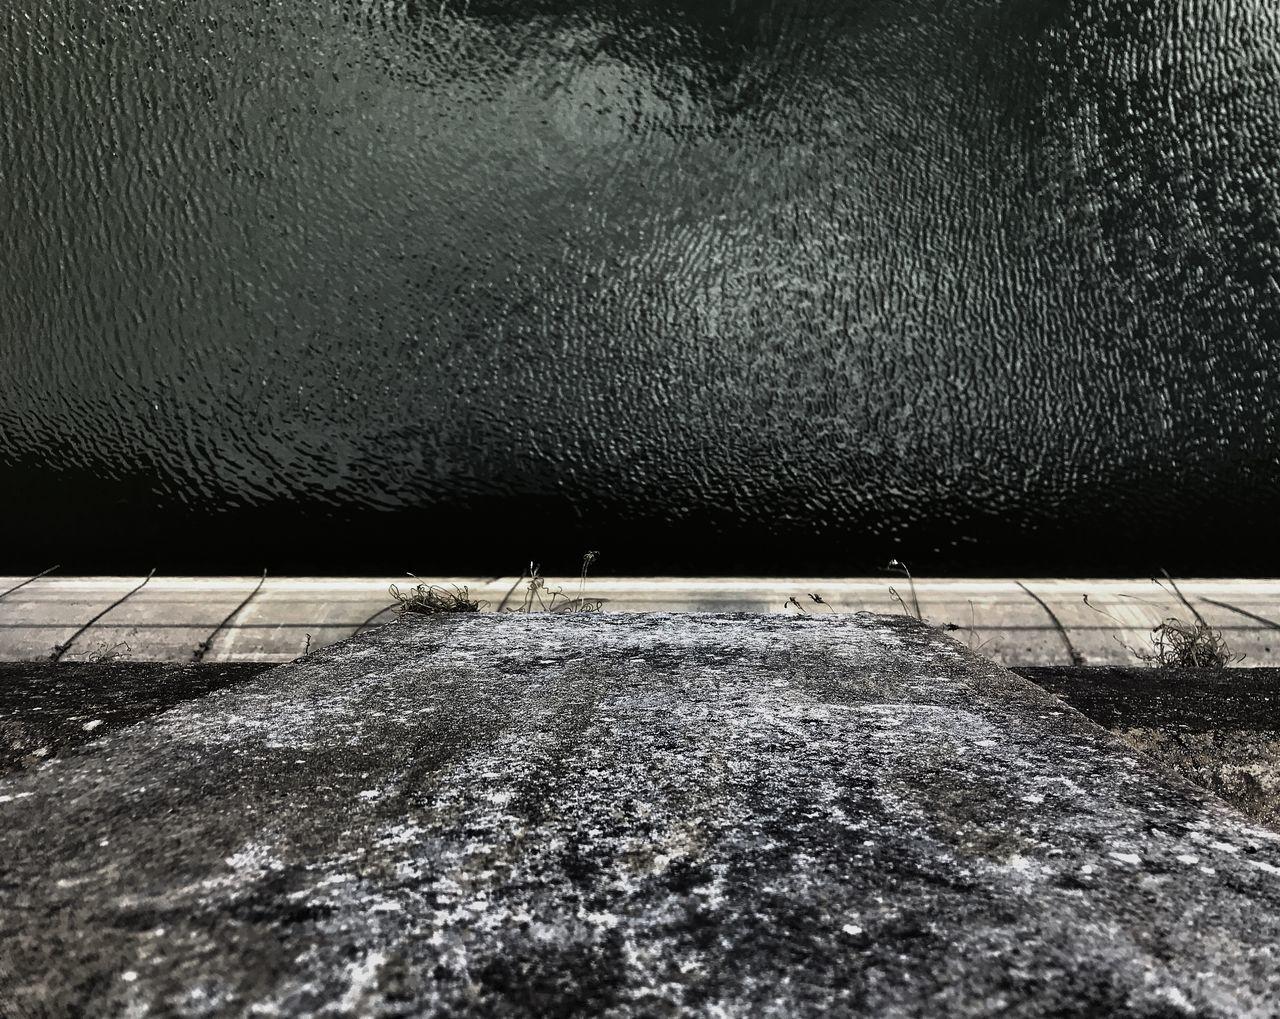 No People Water Waterdam Represa Black & White Symetry High Angle View High Concrete Wall EyeEmNewHere Architecture EyeEmNewHere